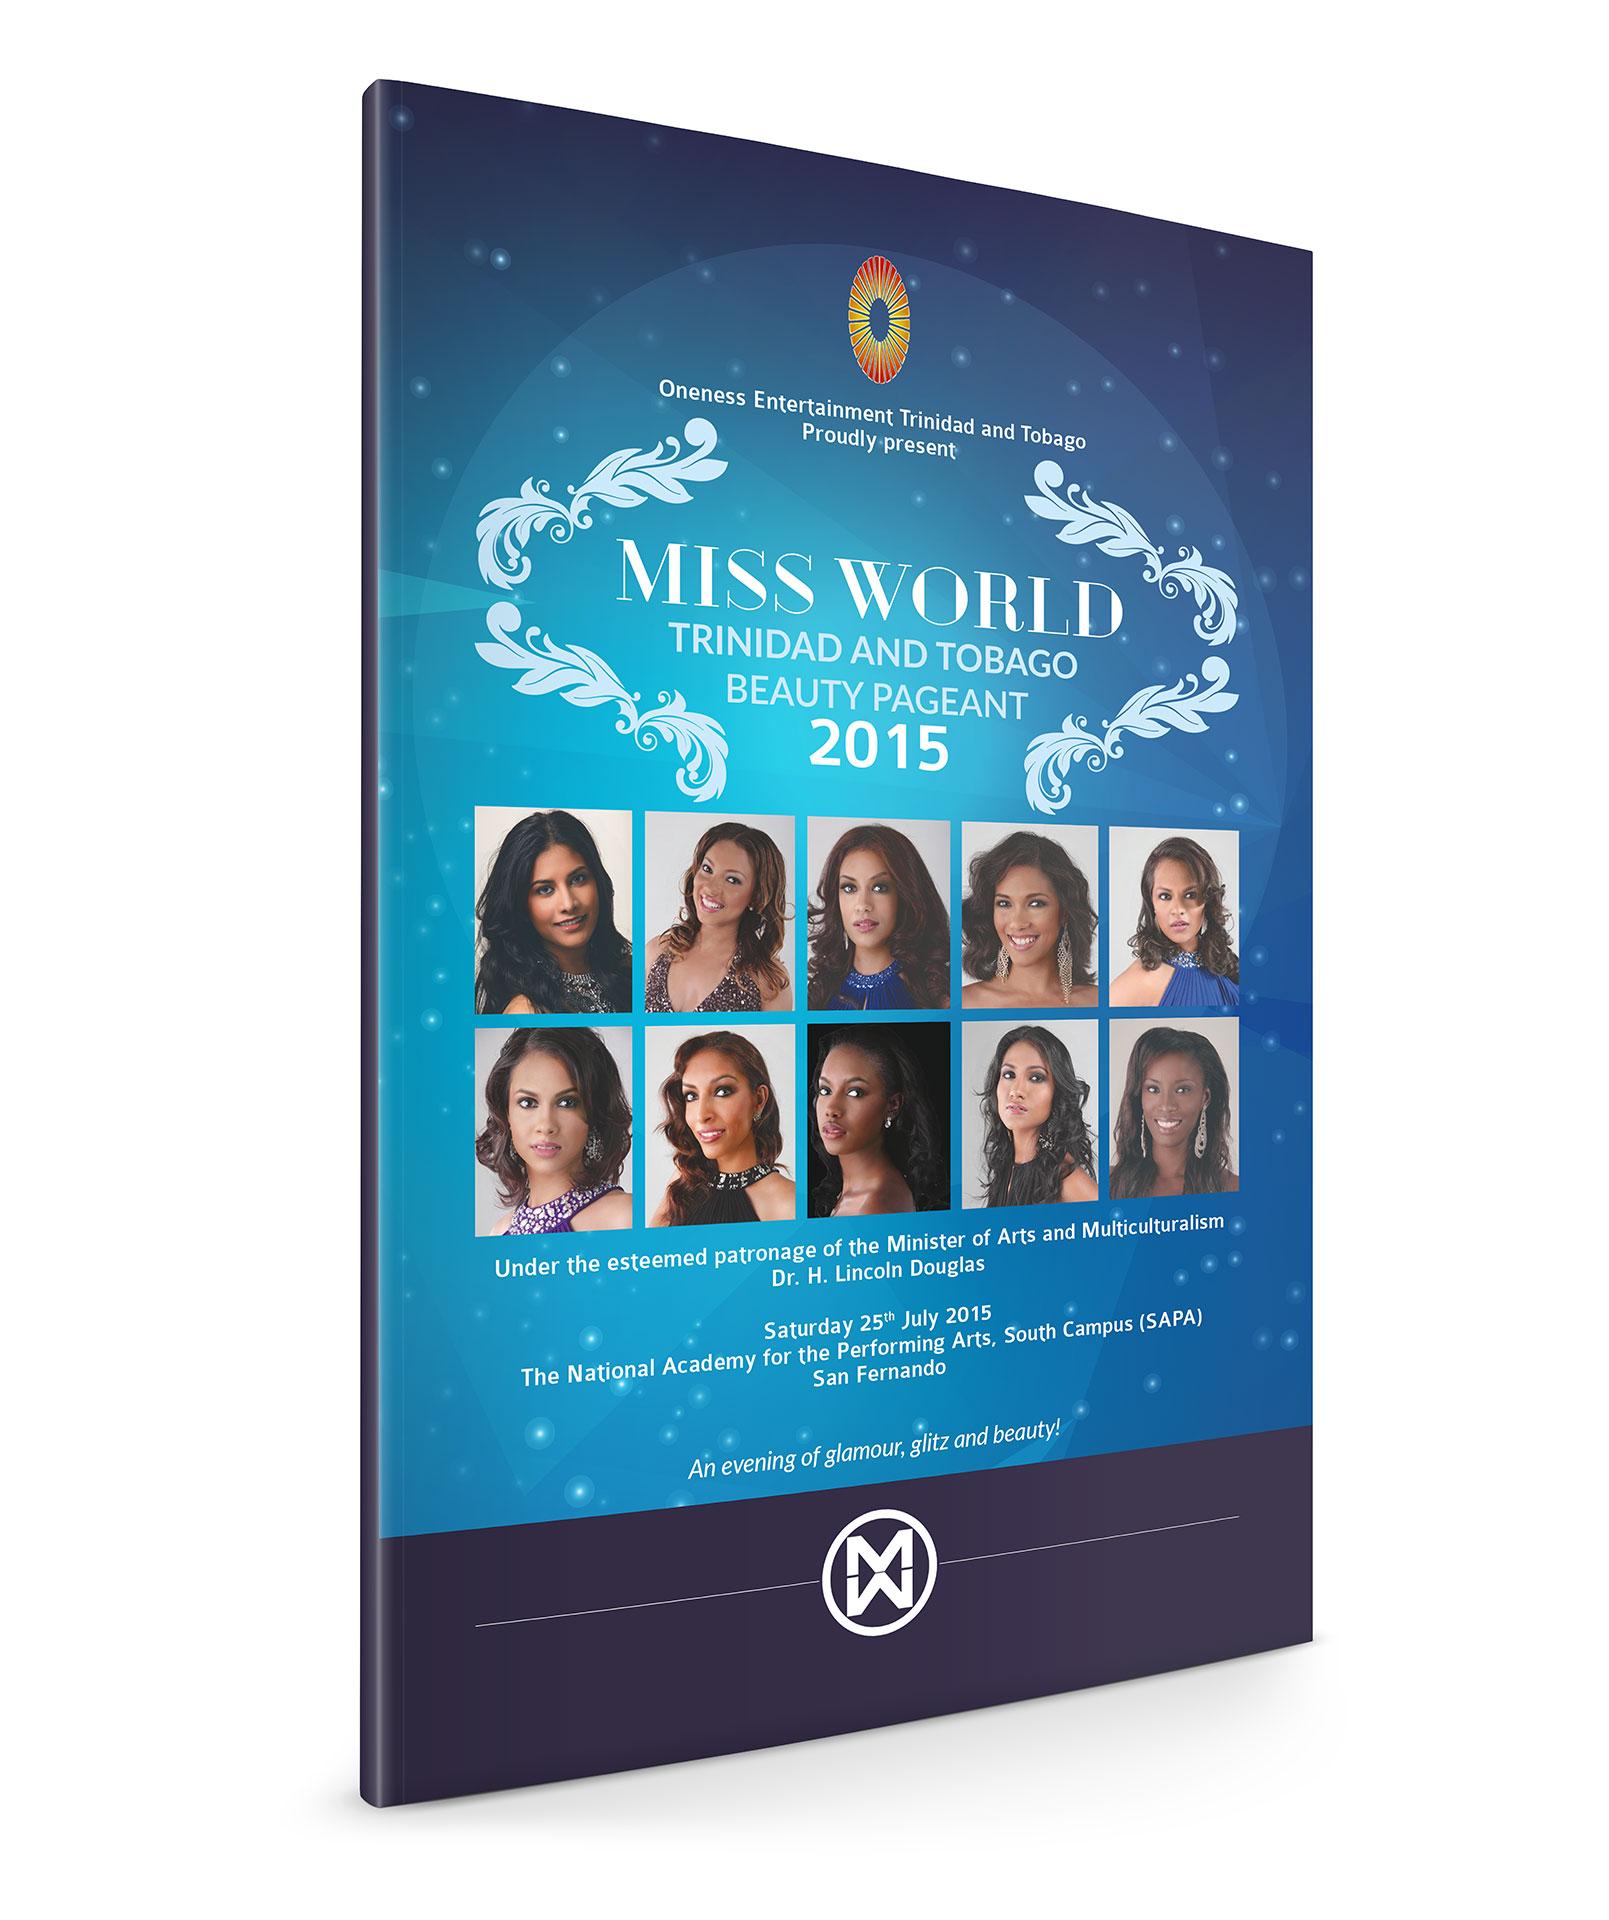 Miss World Trinidad and Tobago 2015